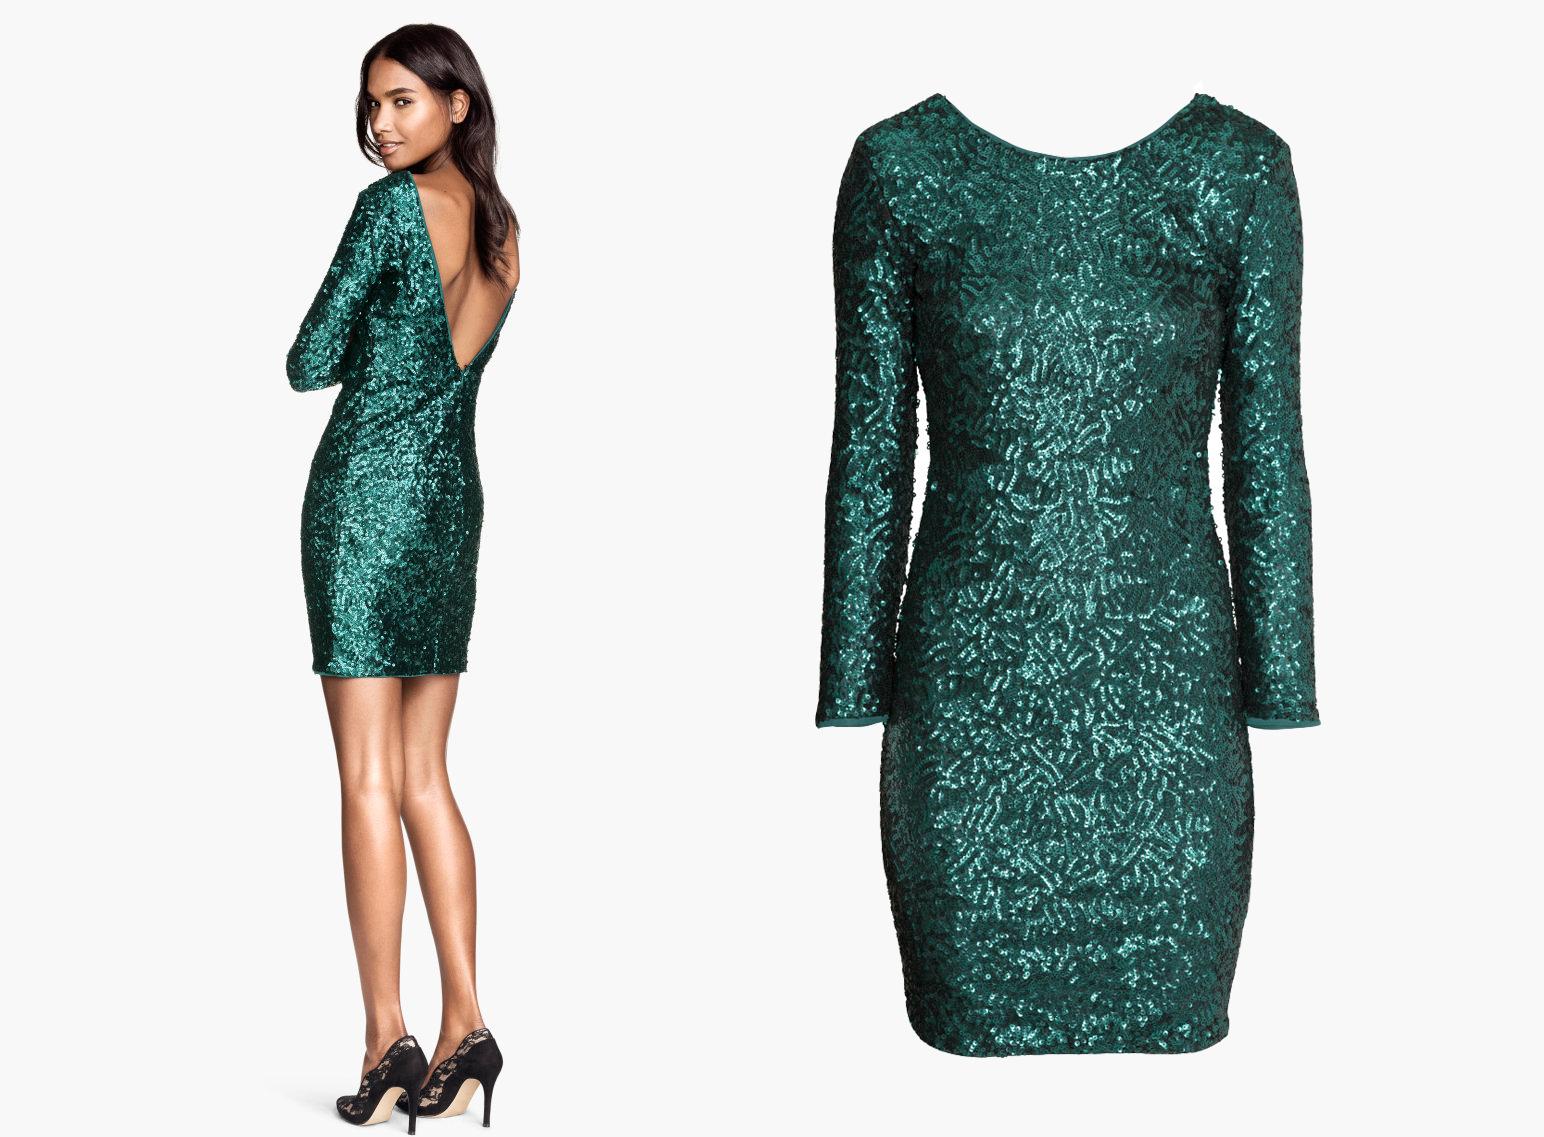 Блестящие мини-платья Saint Laurent - фото №3